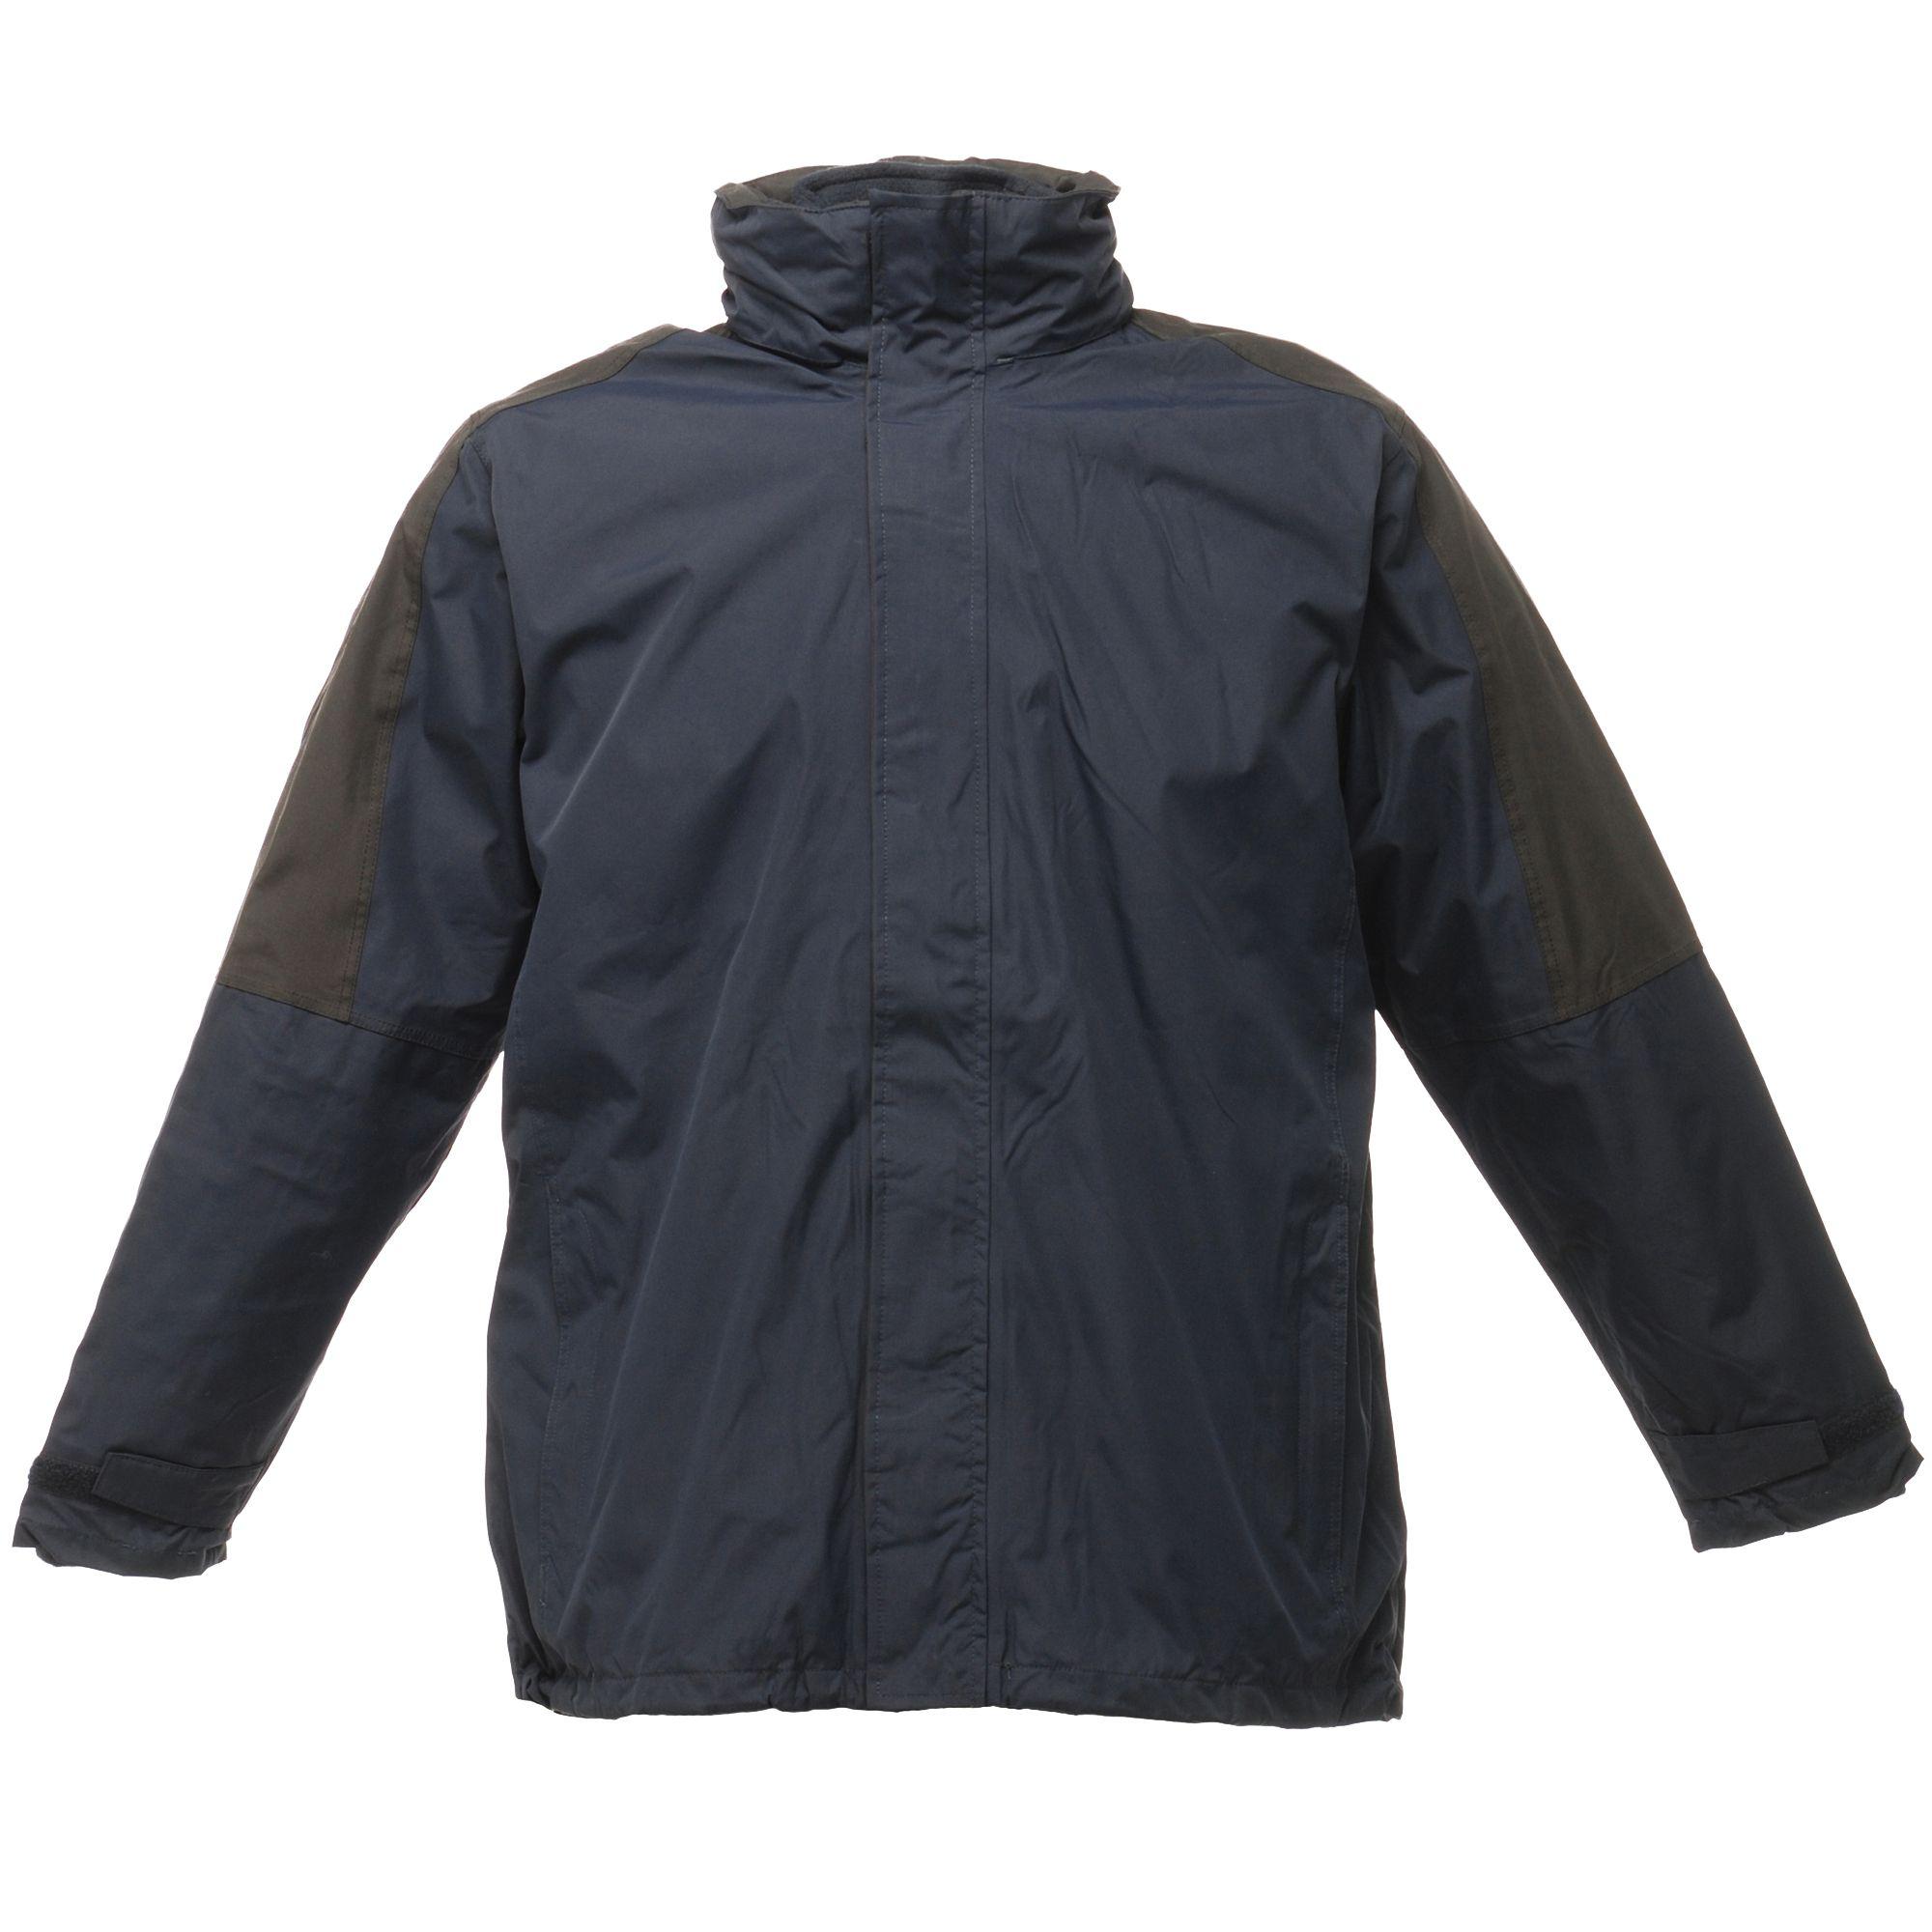 Regatta Mens Defender III 3-in-1 Waterproof Windproof Jacket / Performance Jacket